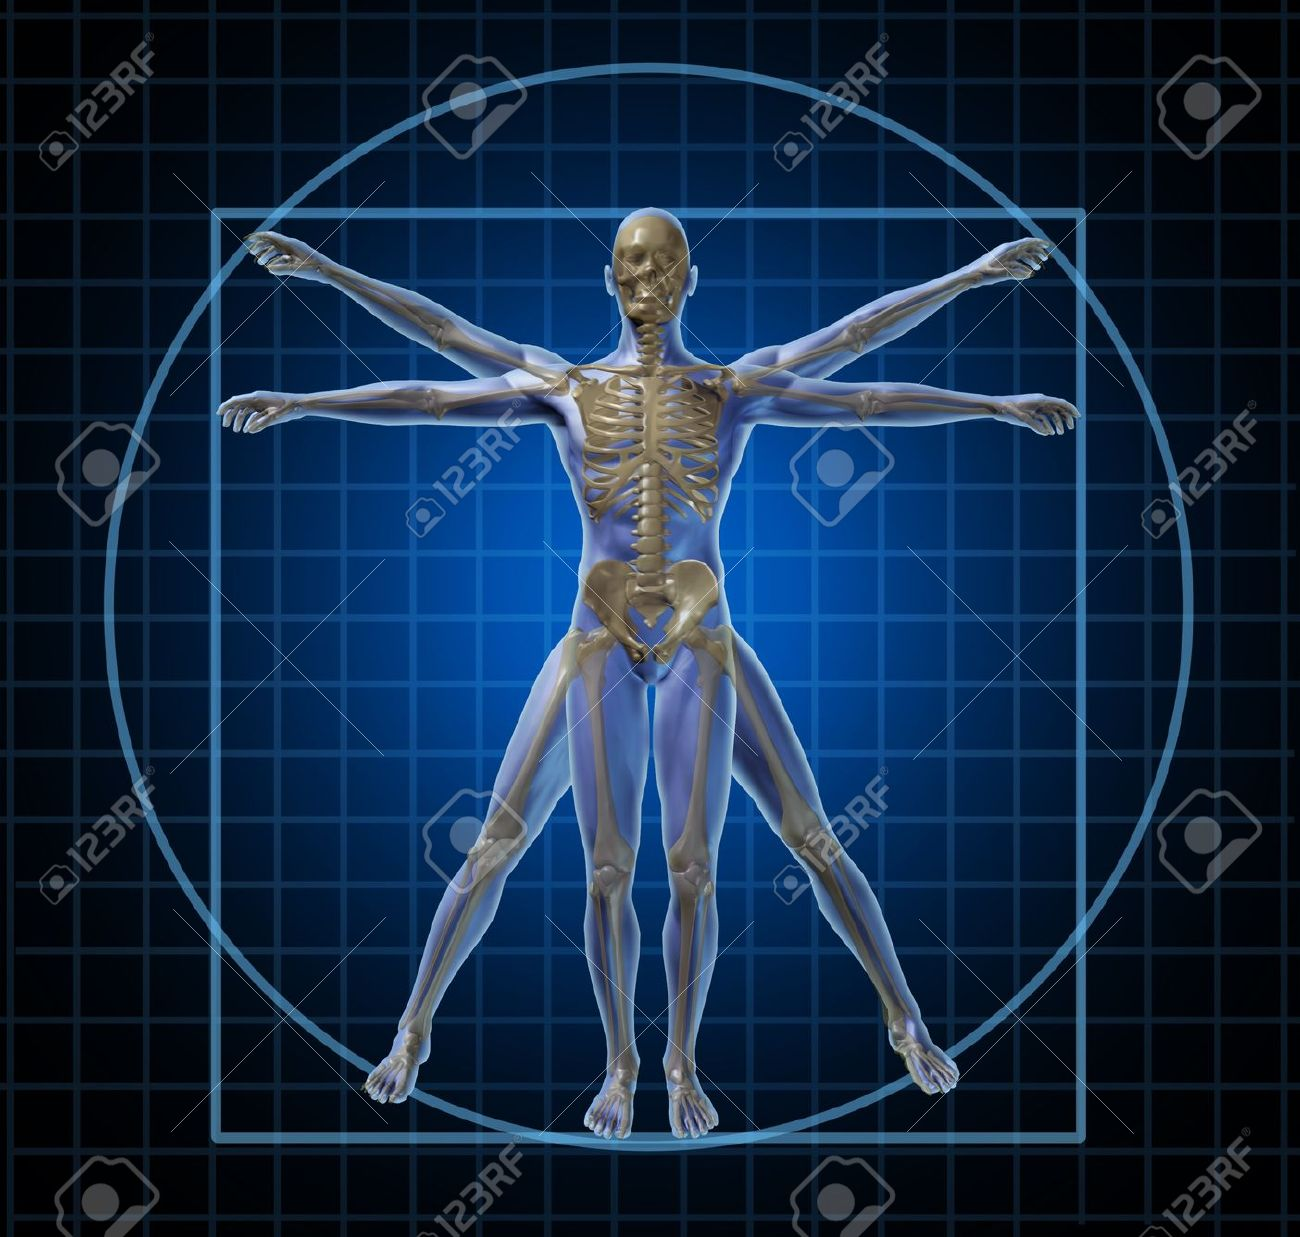 Vitruvian Human Skeleton Man And Body With As A Frontal Leonardo